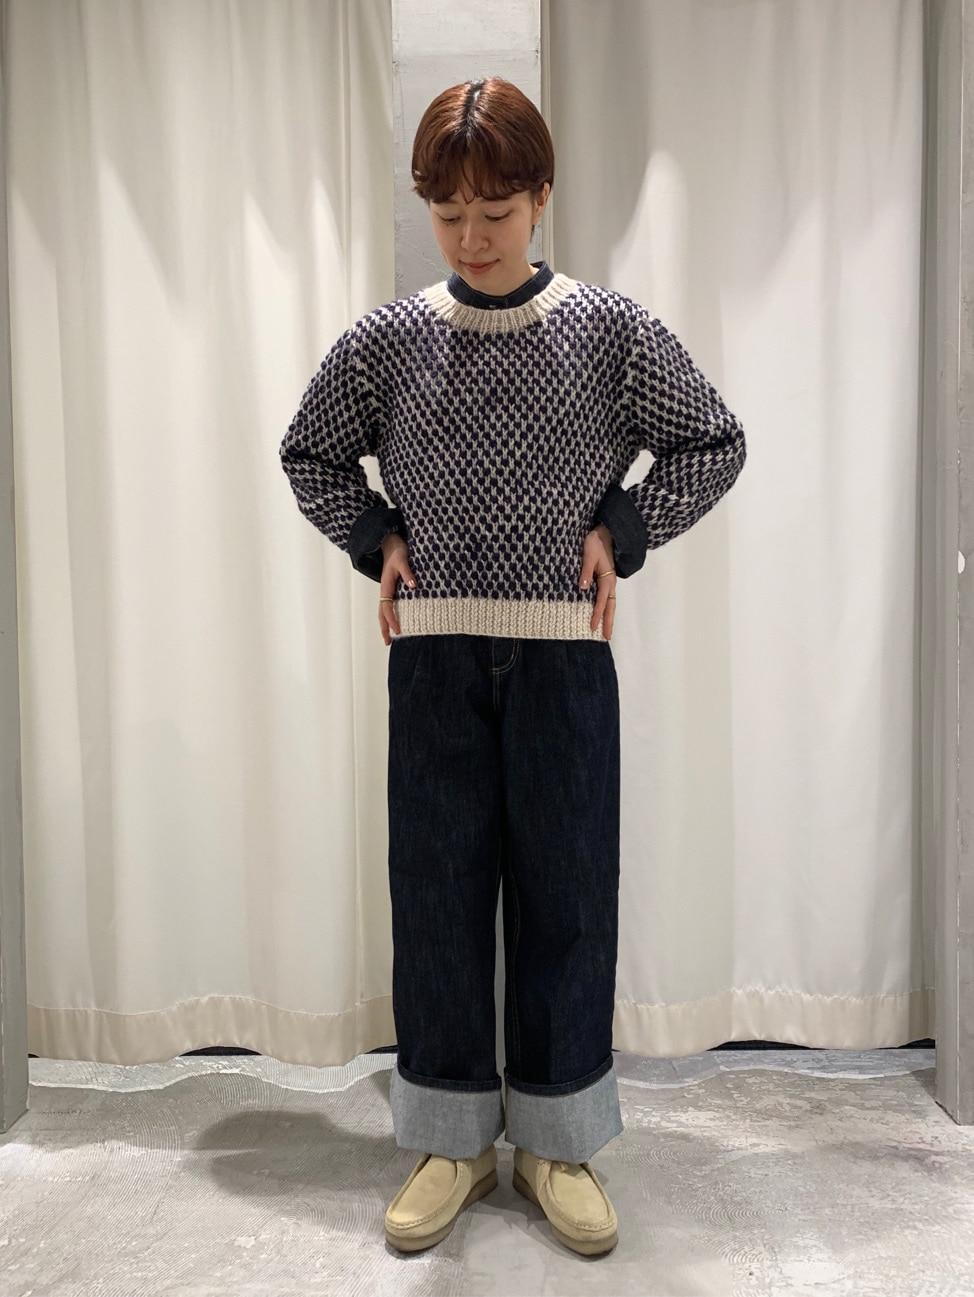 - CHILD WOMAN CHILD WOMAN , PAR ICI ルミネ横浜 身長:158cm 2020.09.30